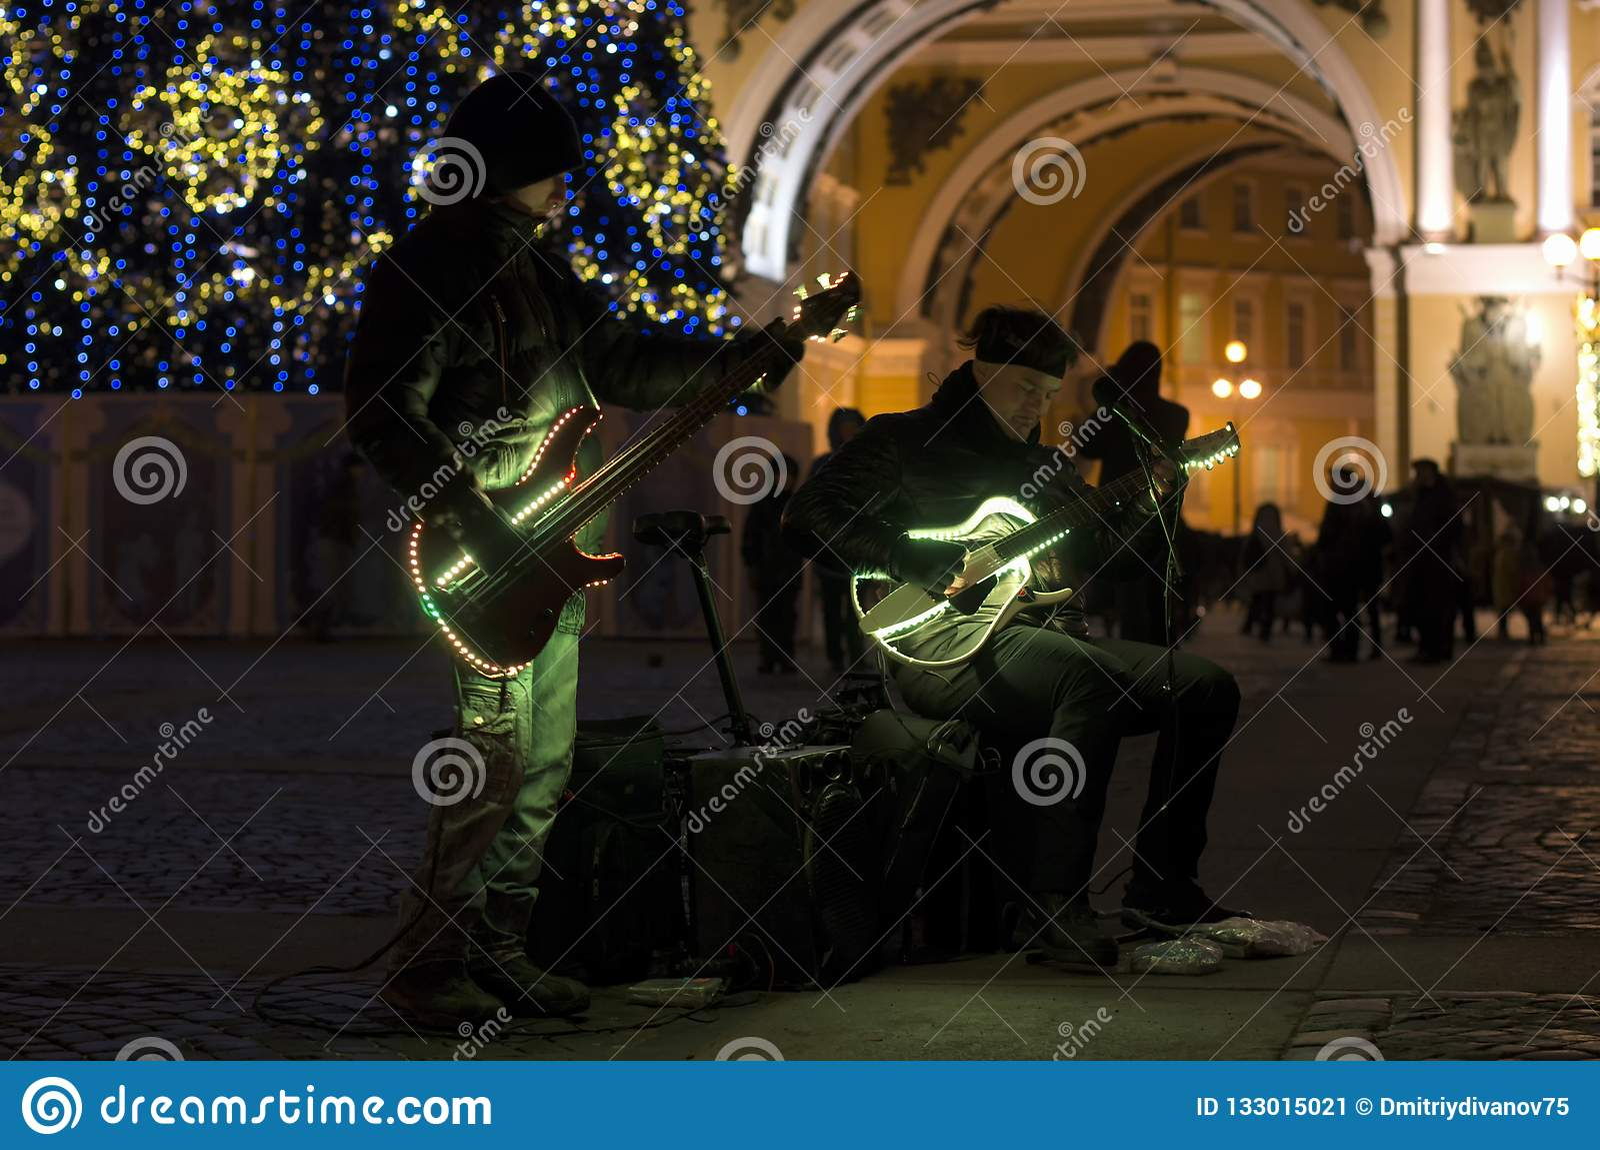 Street musicians with night illumination and Christmas tree